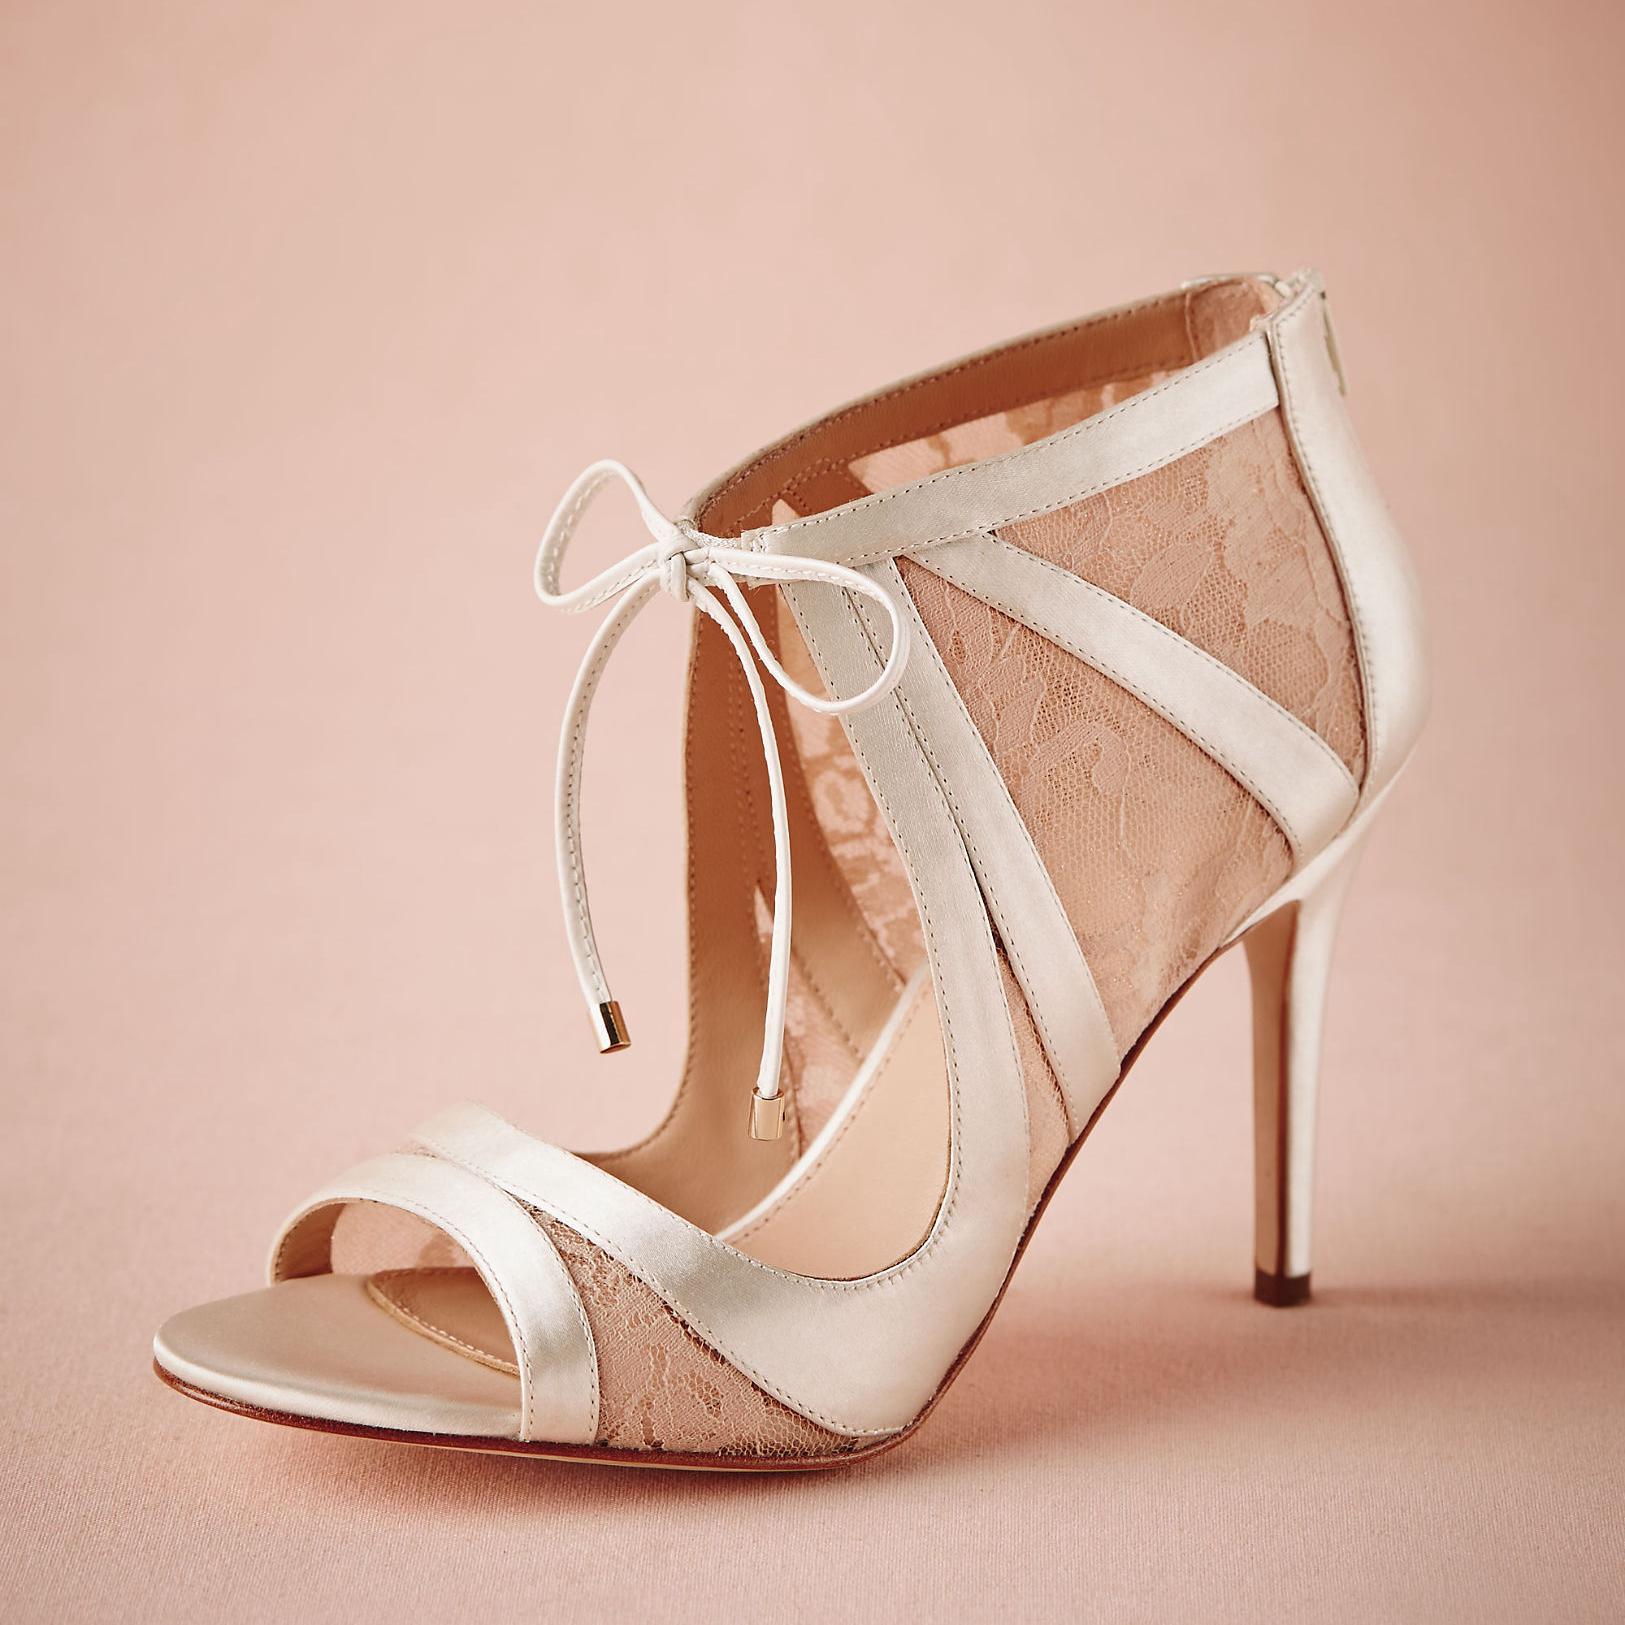 Ivory Satin Wedding Boots Knee High Lace Fabric Stiletto Heels